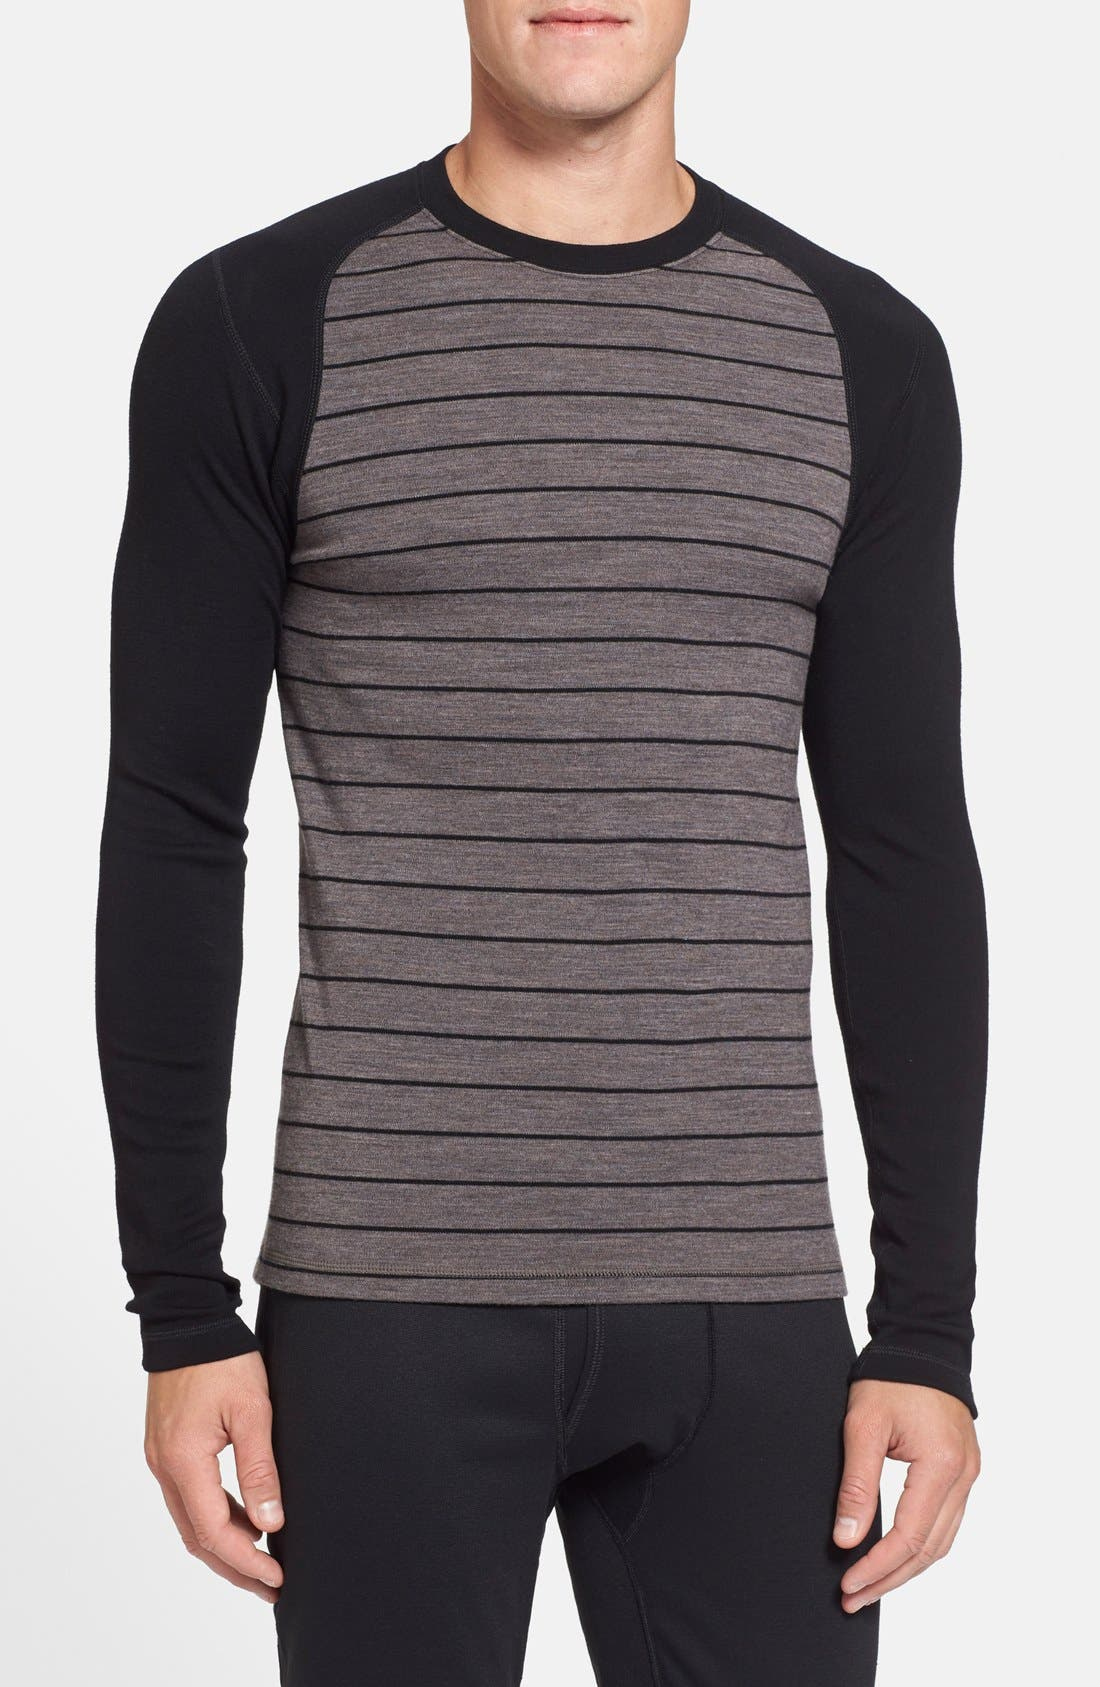 Main Image - Smartwool 250g Base Layer Midweight Crewneck Shirt